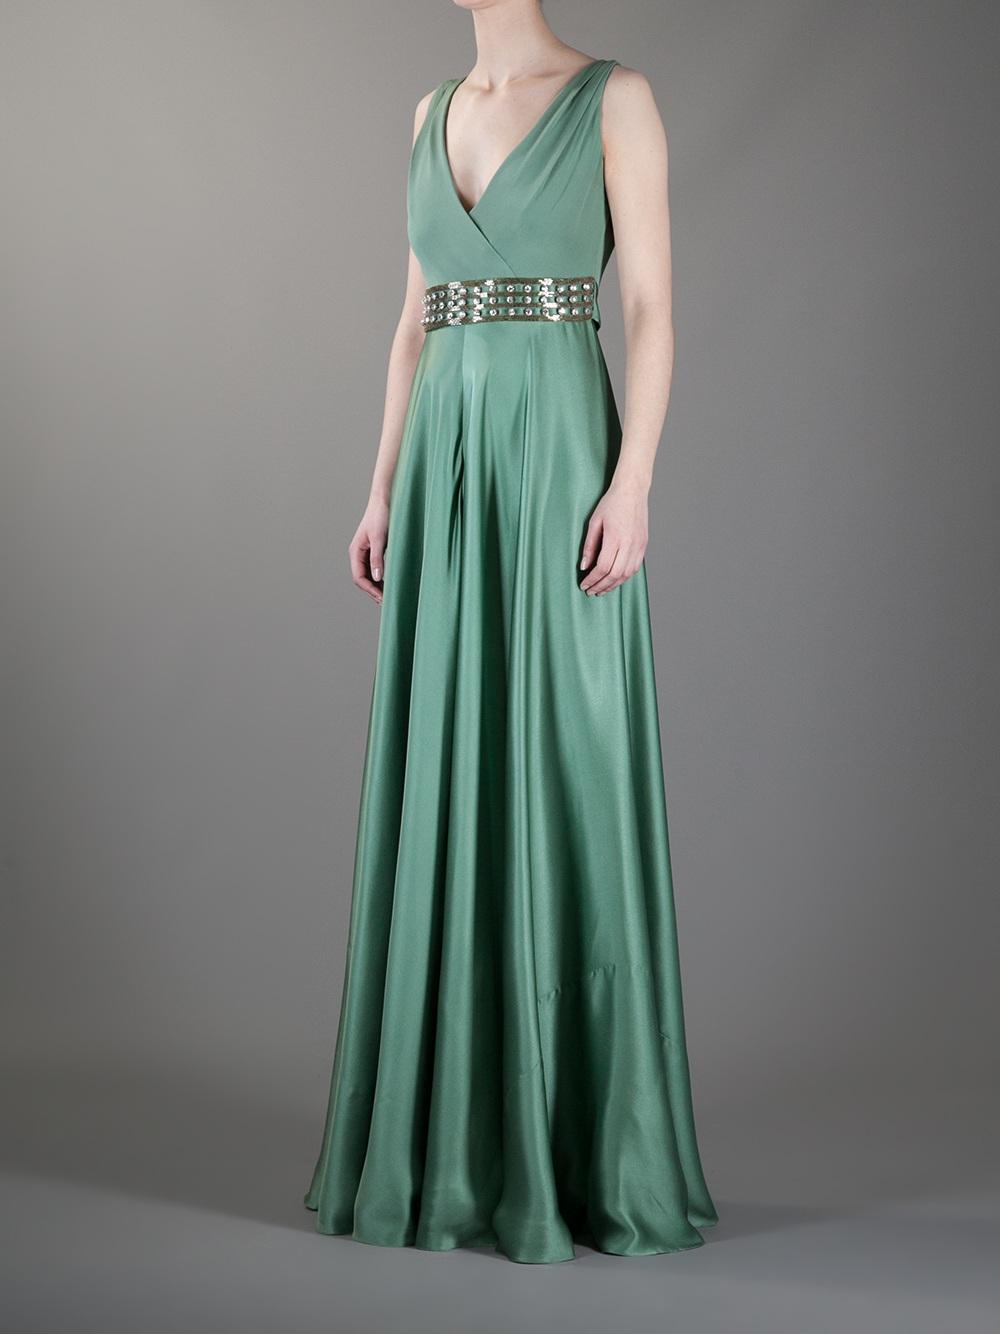 londre evening dresses